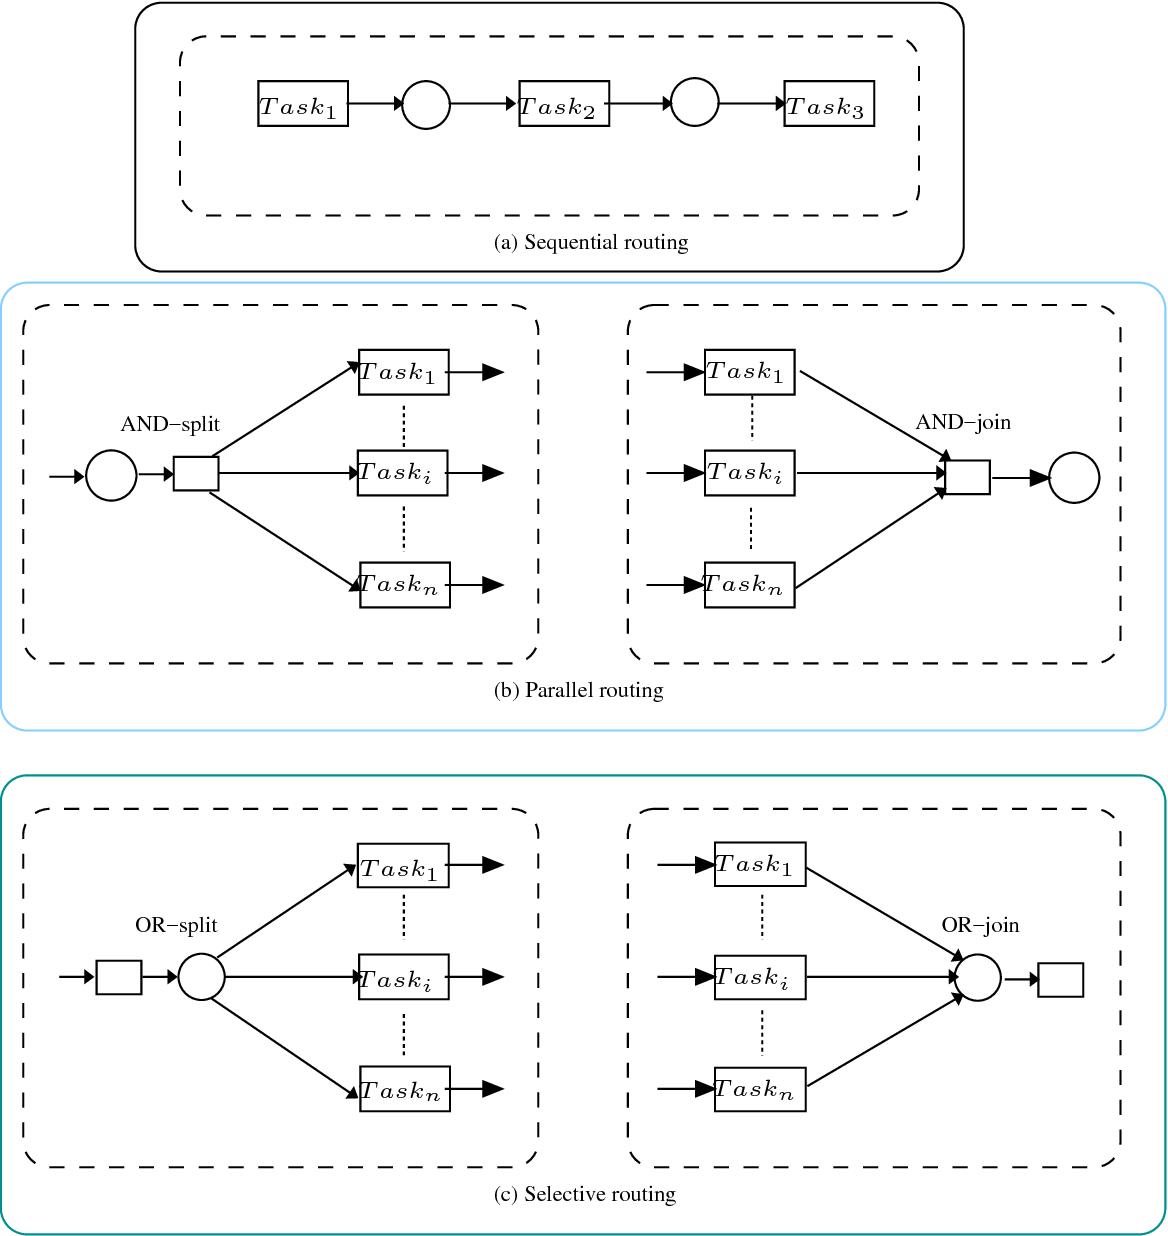 Figure 4.2: Basic workflow routings